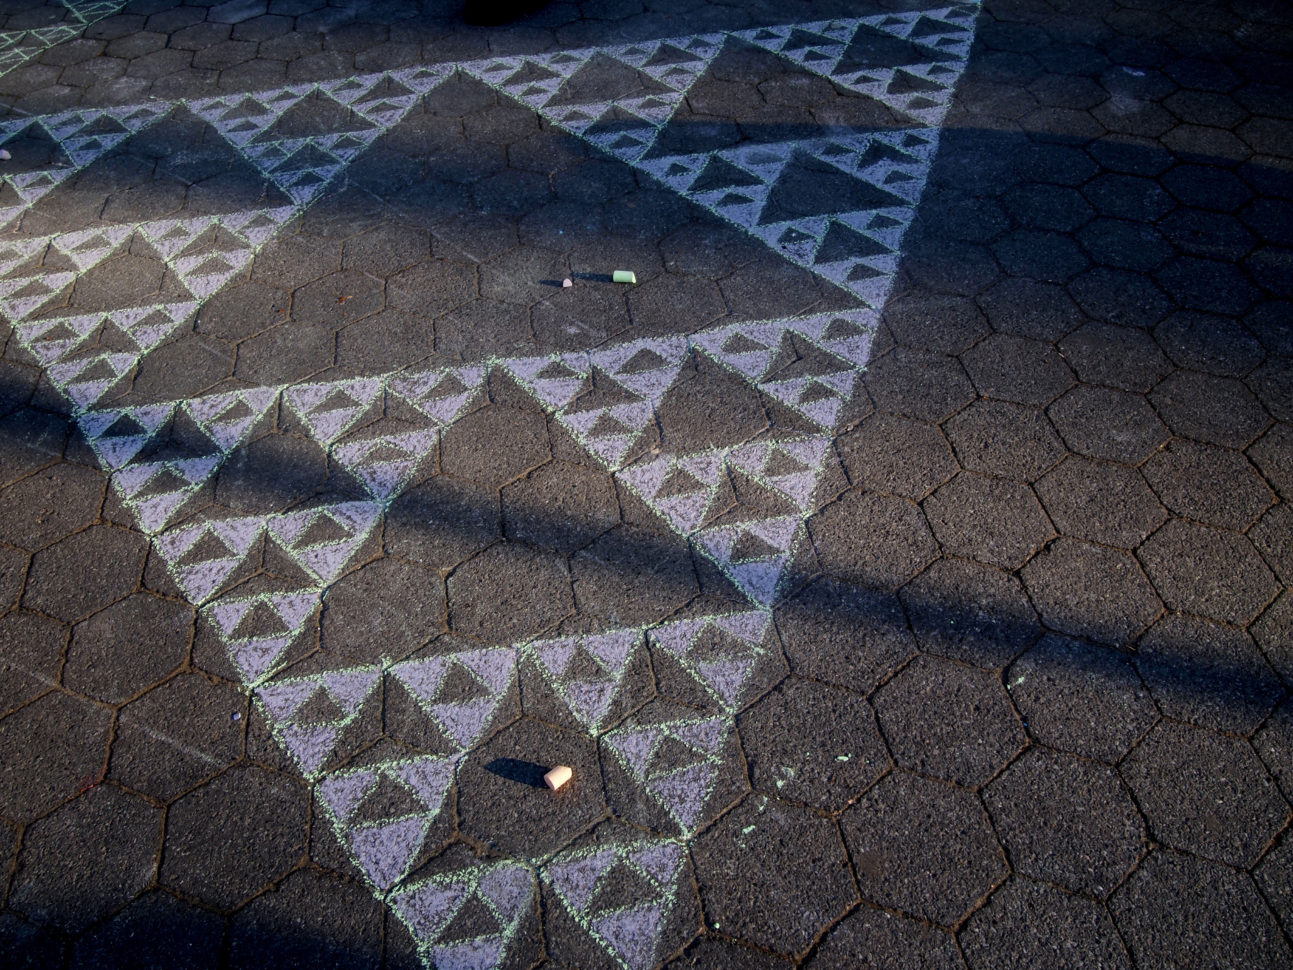 Sierpinski Triangle Worksheet Answers